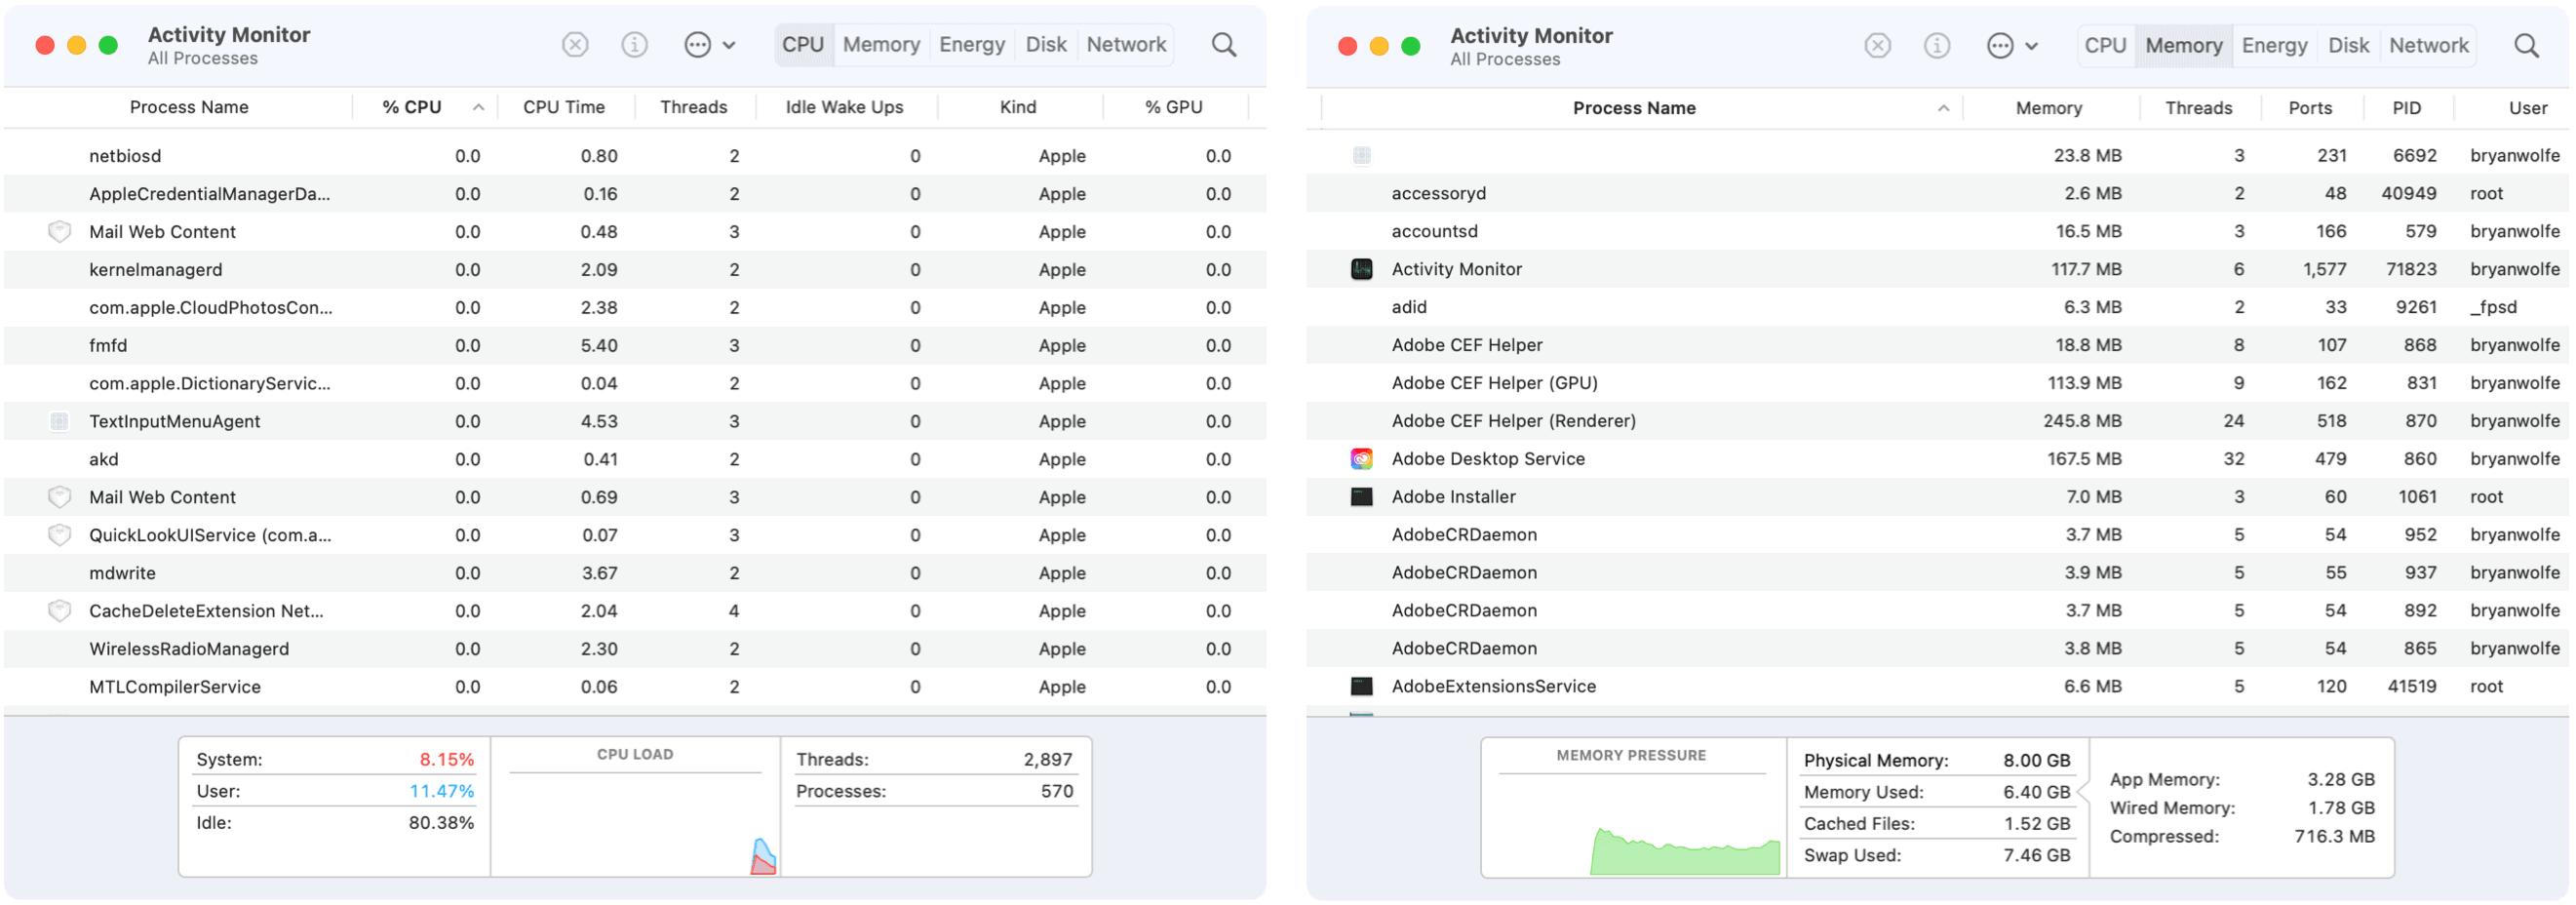 Activity Monitor CPU and Memory